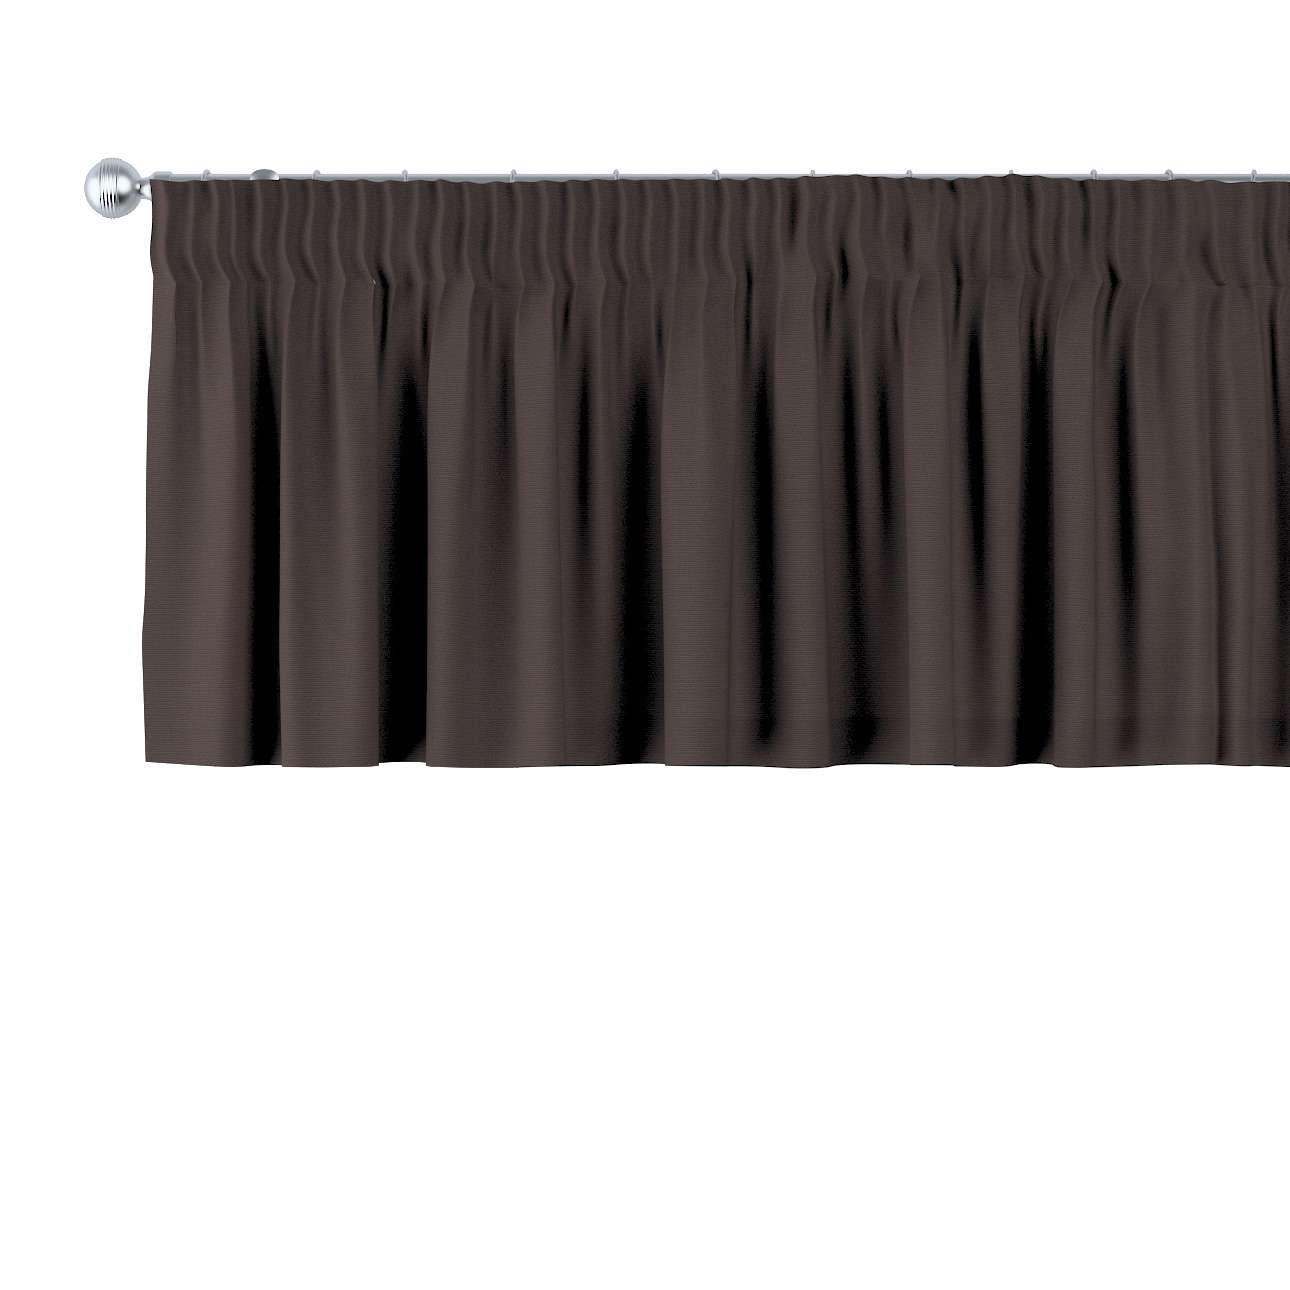 Kurzgardine mit Kräuselband, Kaffee, 390 × 40 cm, Cotton Panama